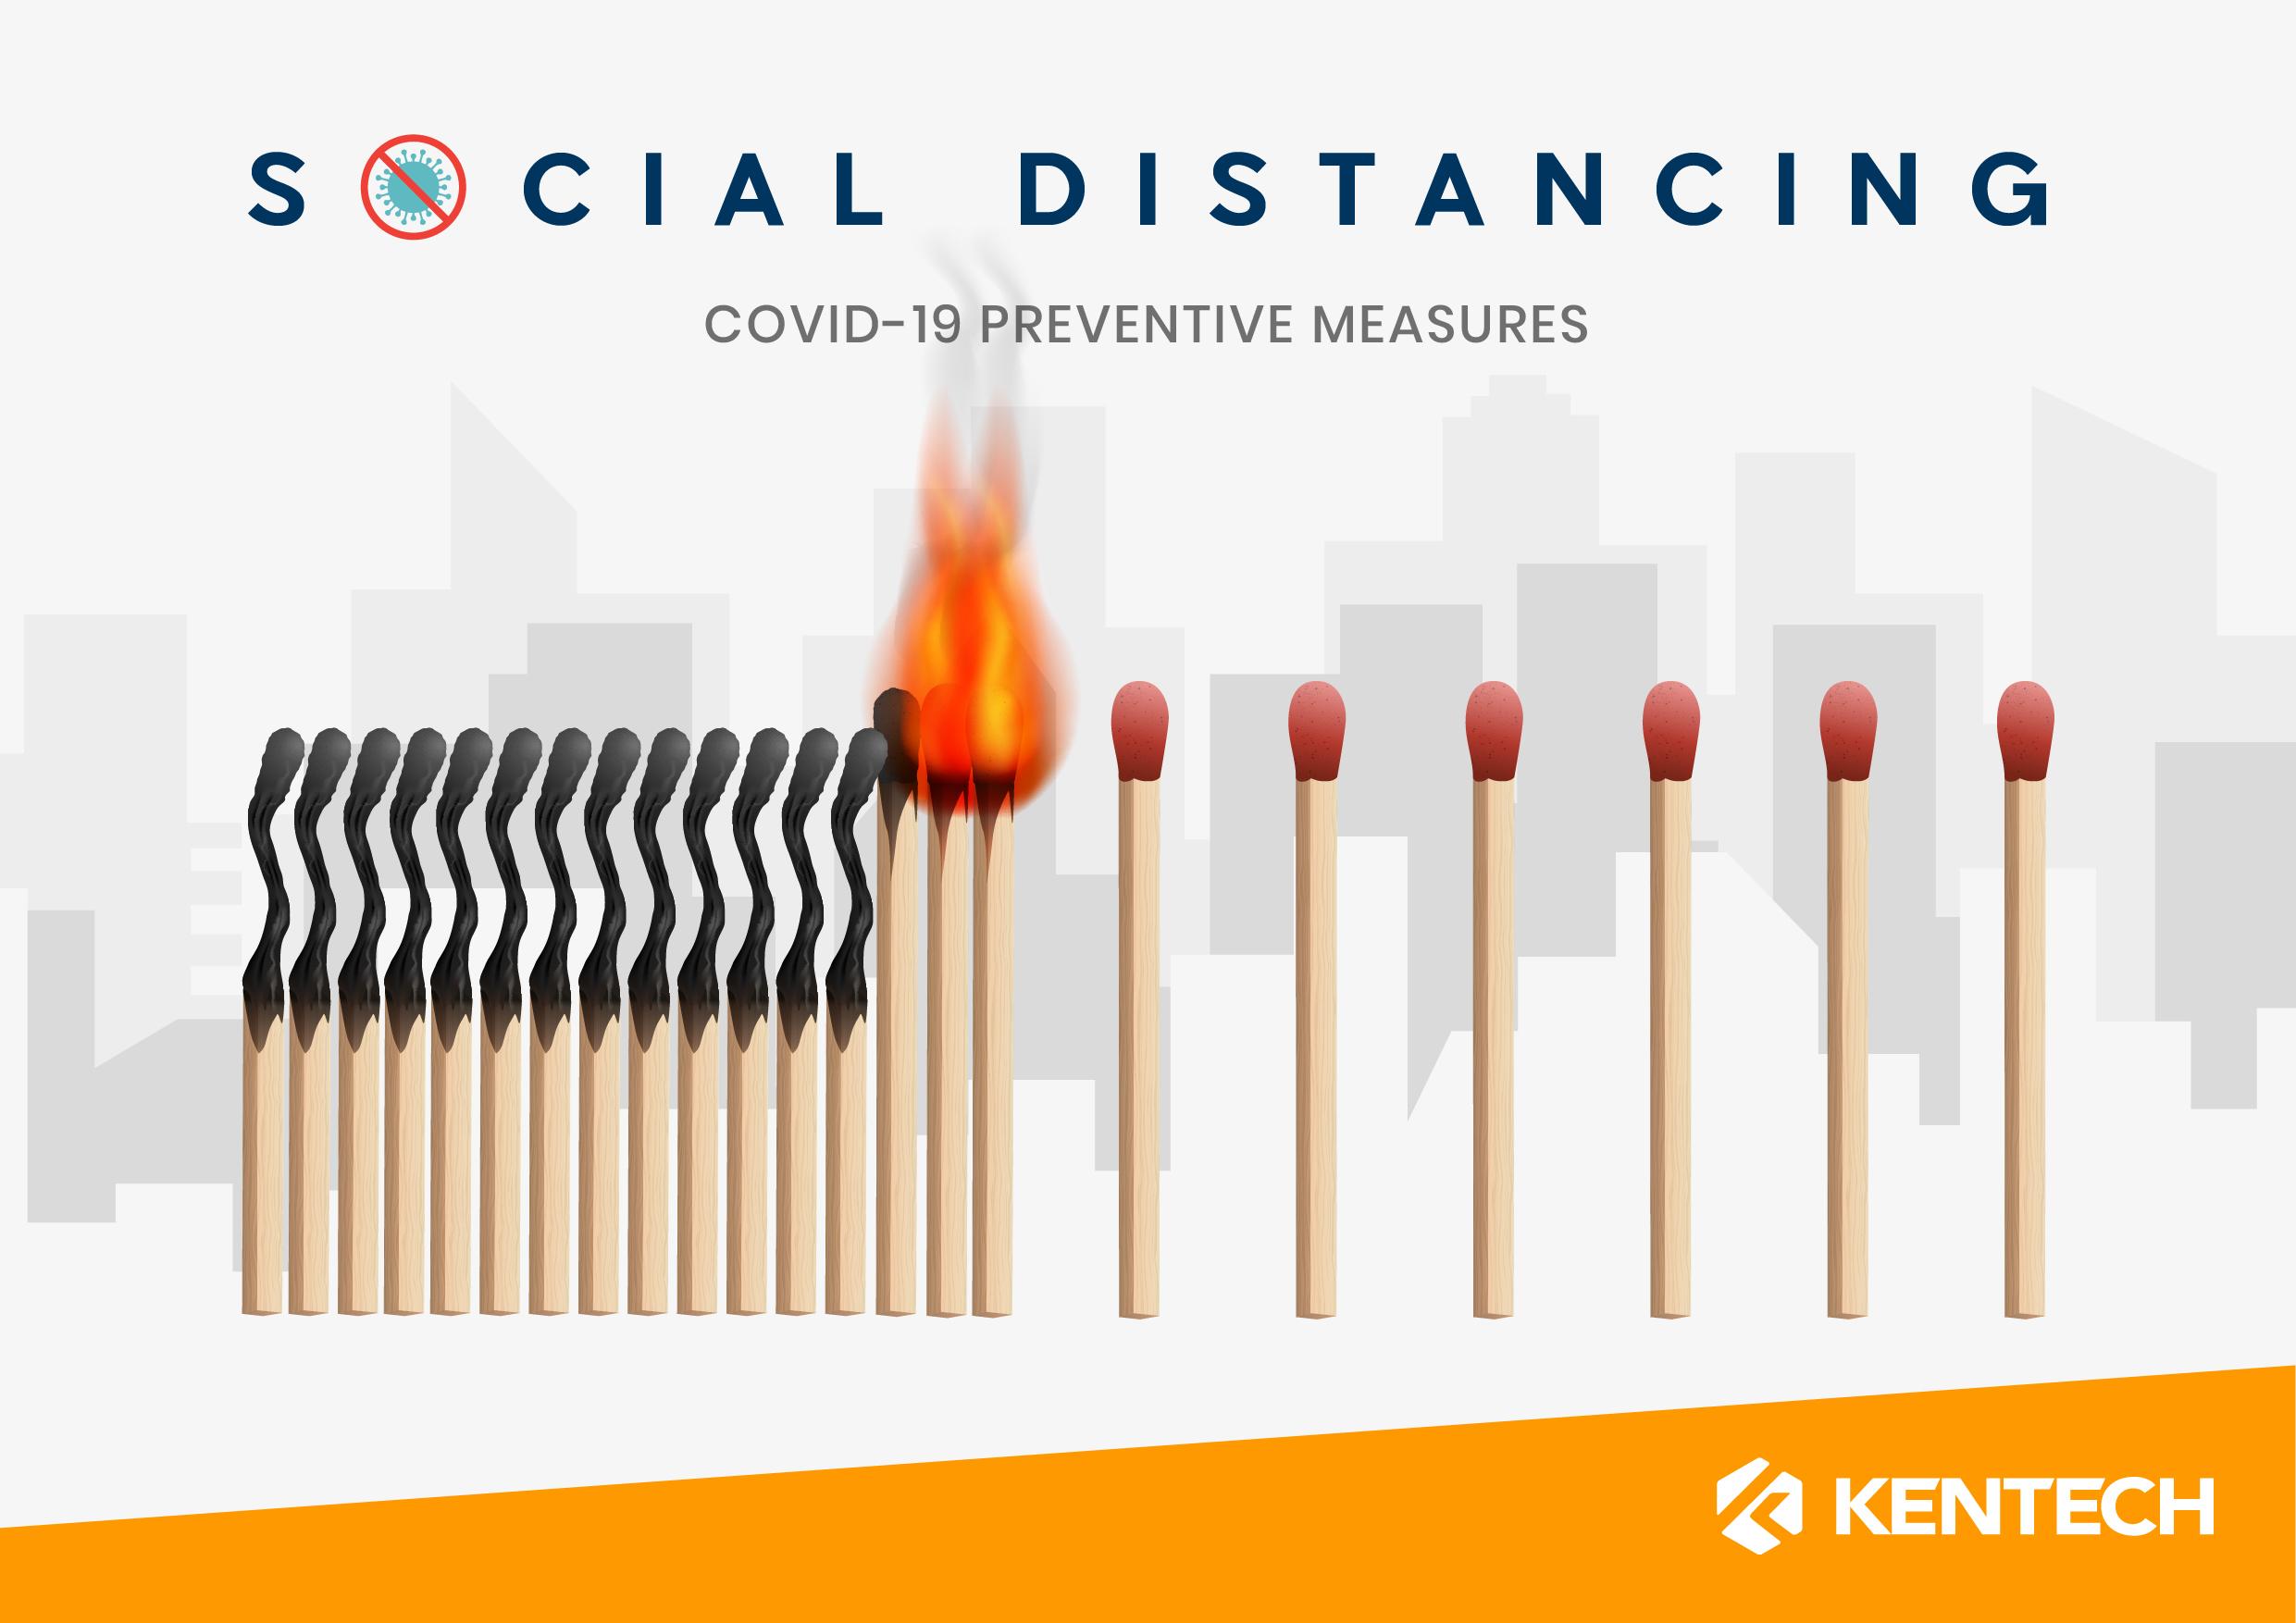 Kentech_Covid-19_SocialDistance-04-01